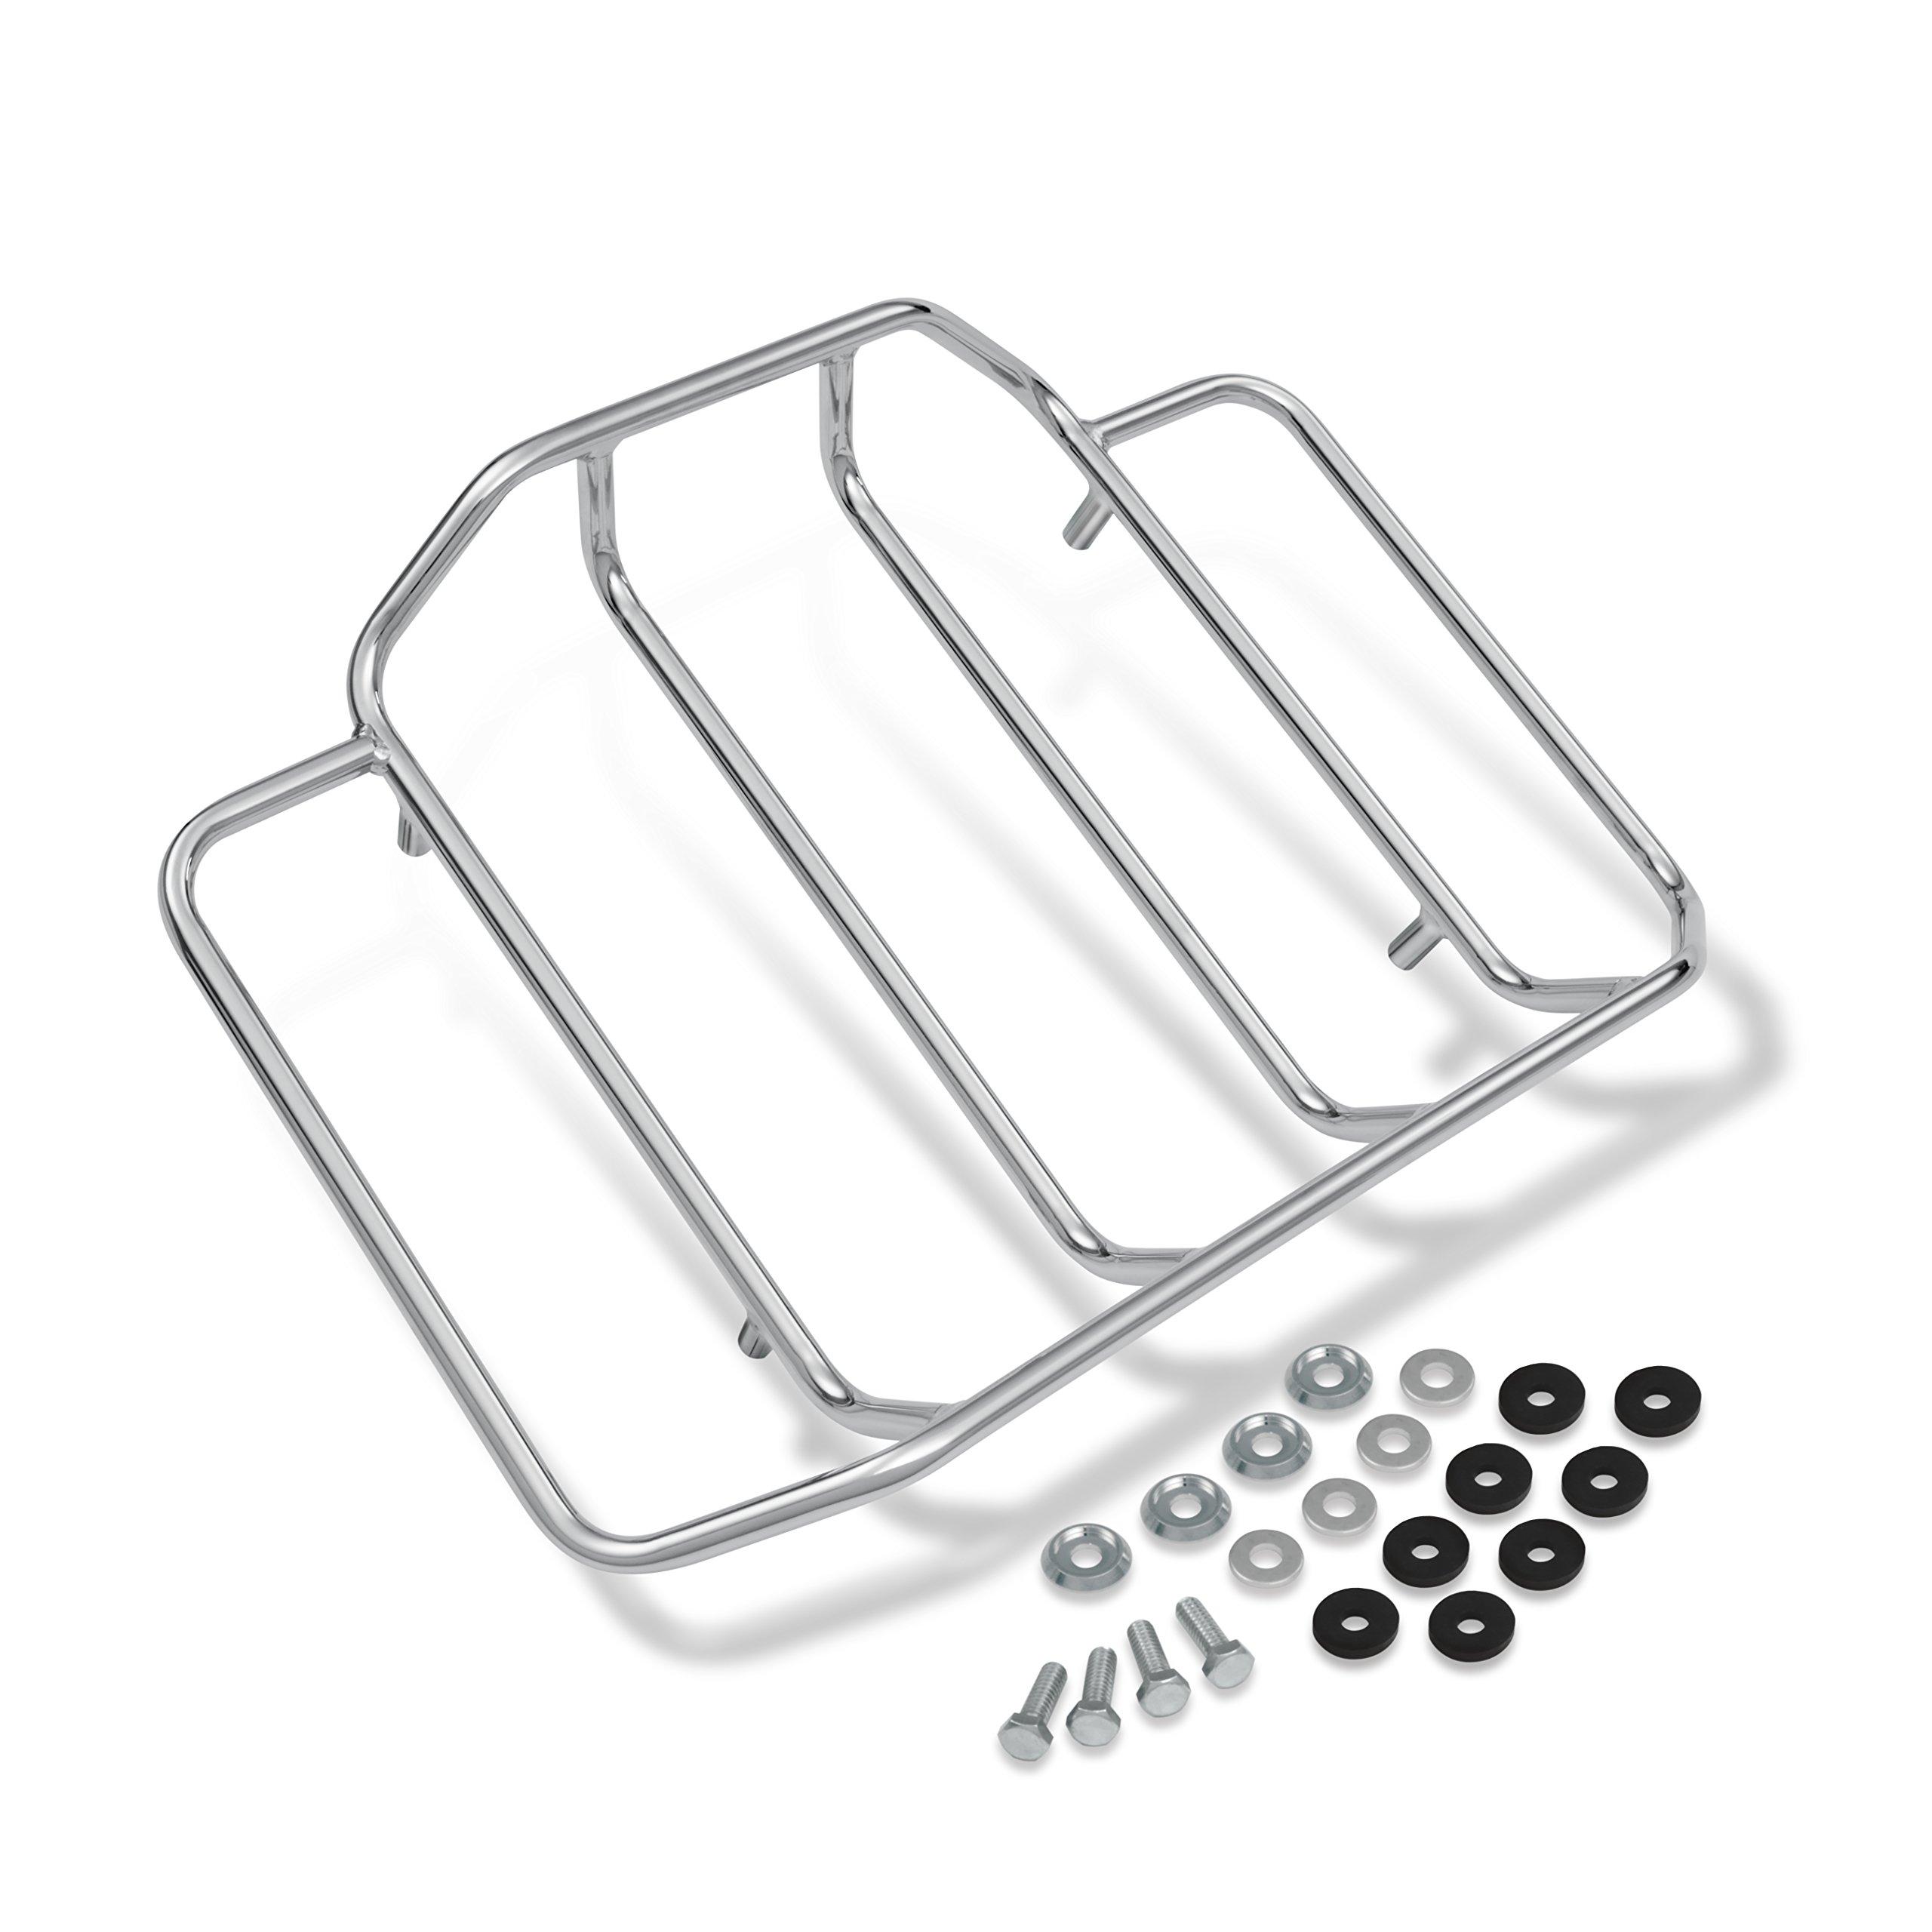 Transparent Hose /& Stainless Black Banjos Pro Braking PBC1176-CLR-BLA Braided Clutch Line